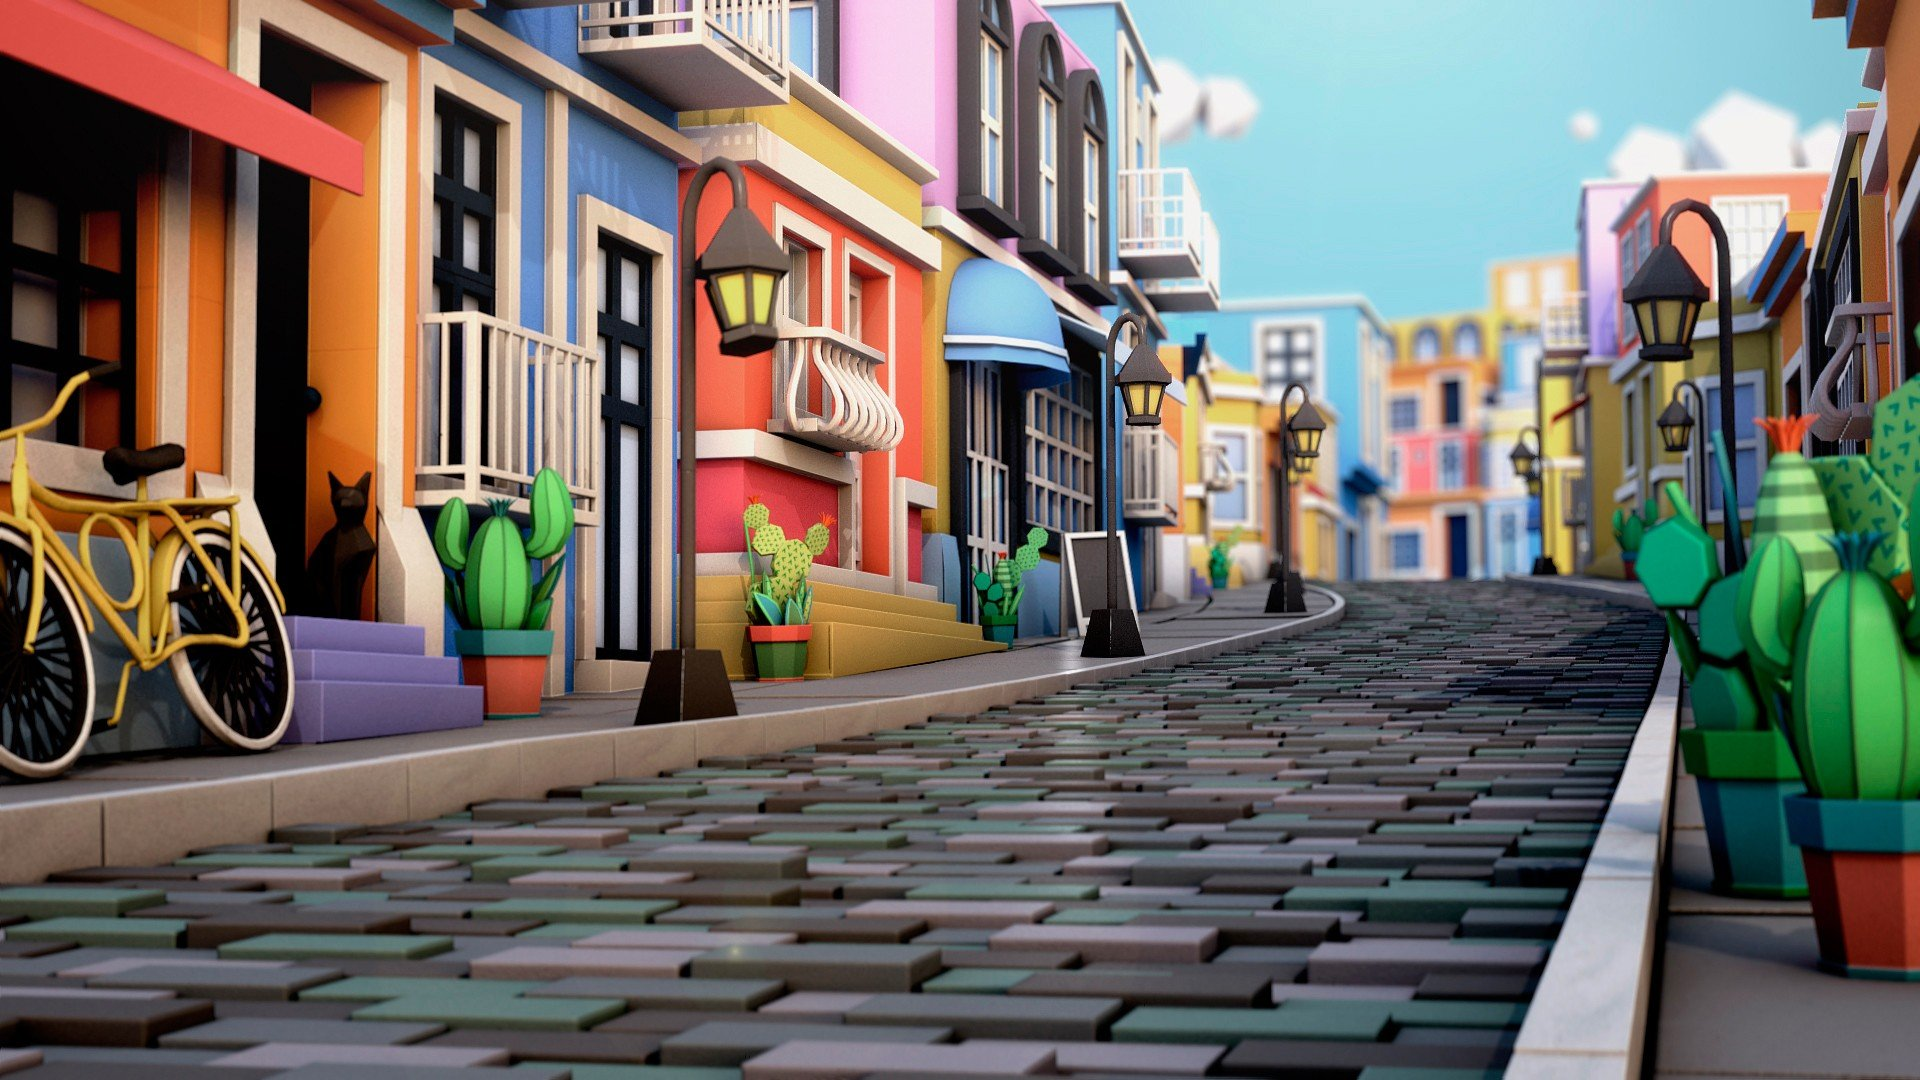 Cinema 4d R12 Keygen - linoaads.web.fc2.com